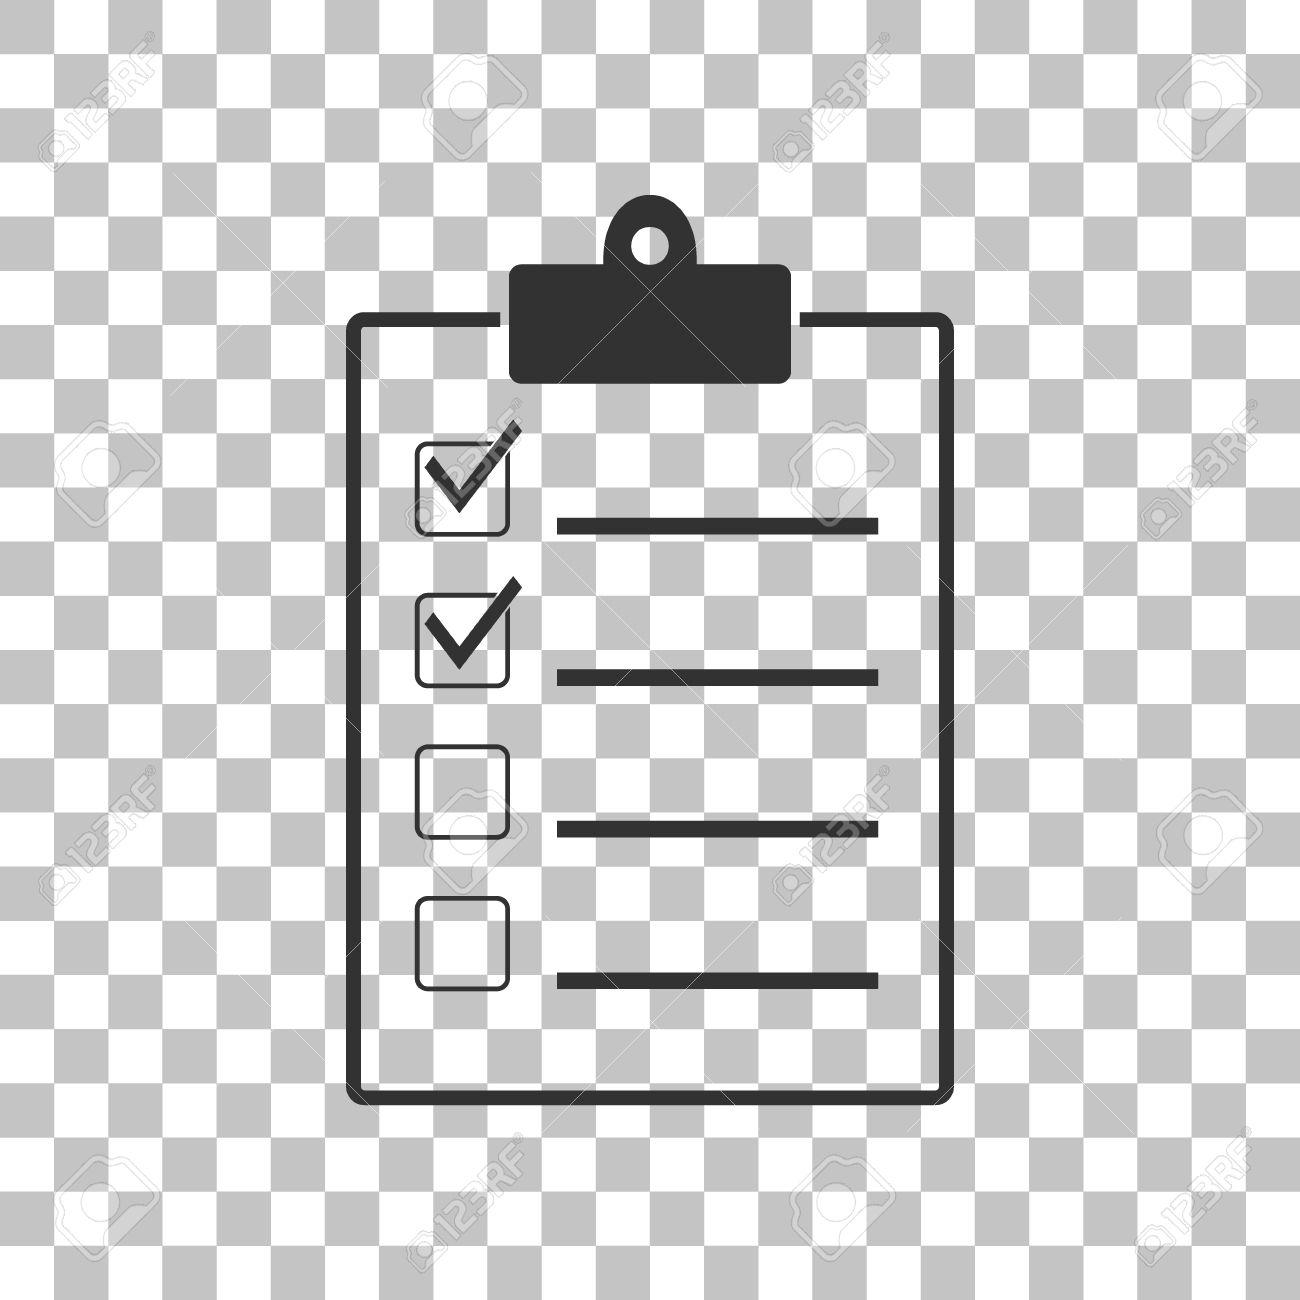 checklist sign illustration. dark gray icon on transparent